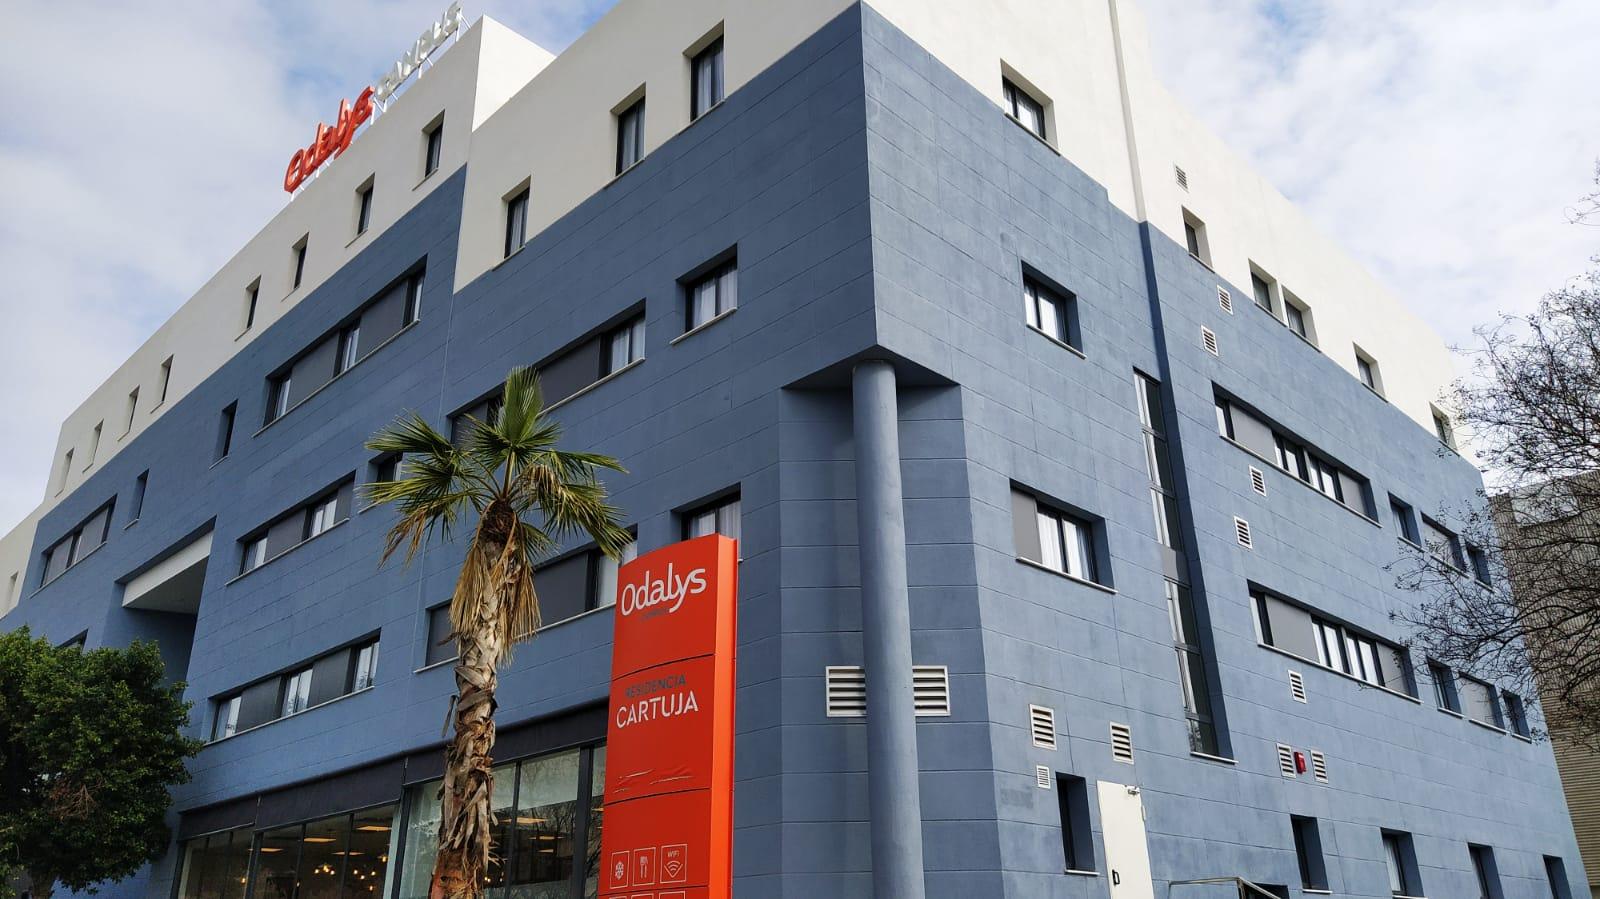 residencia odalys campus Sevilla